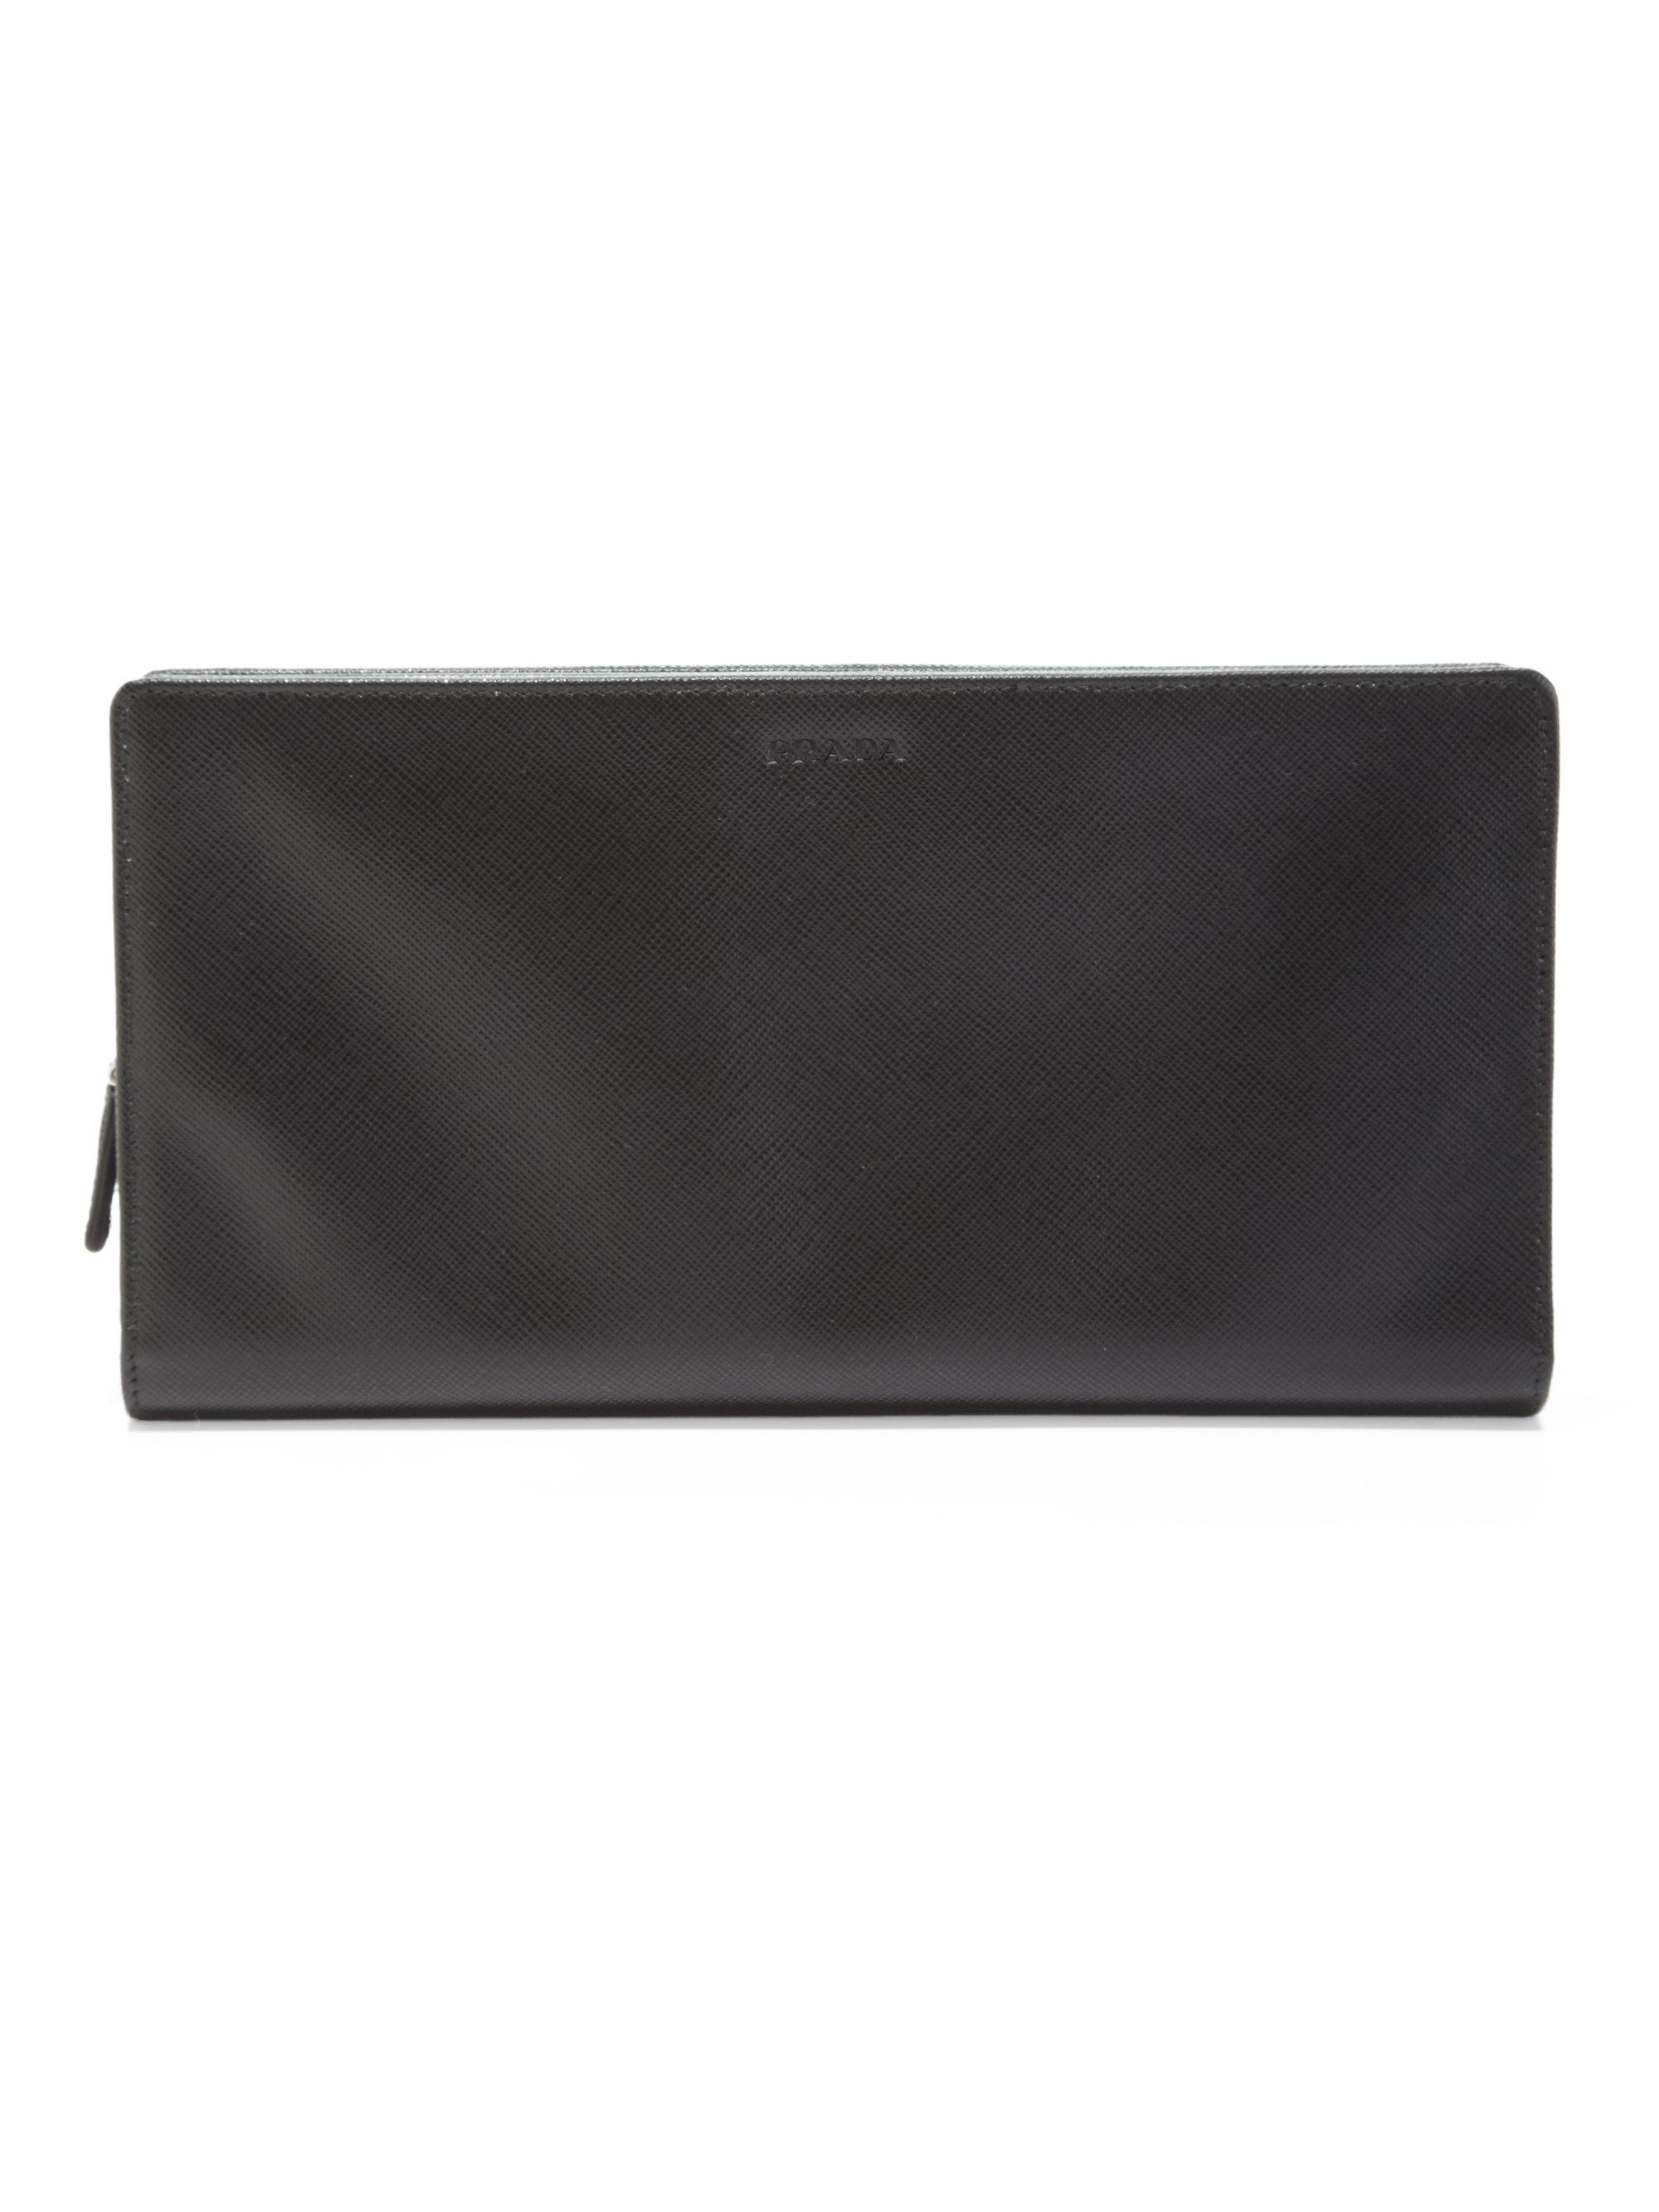 Prada Saffiano Travel Wallet in Black for Men | Lyst